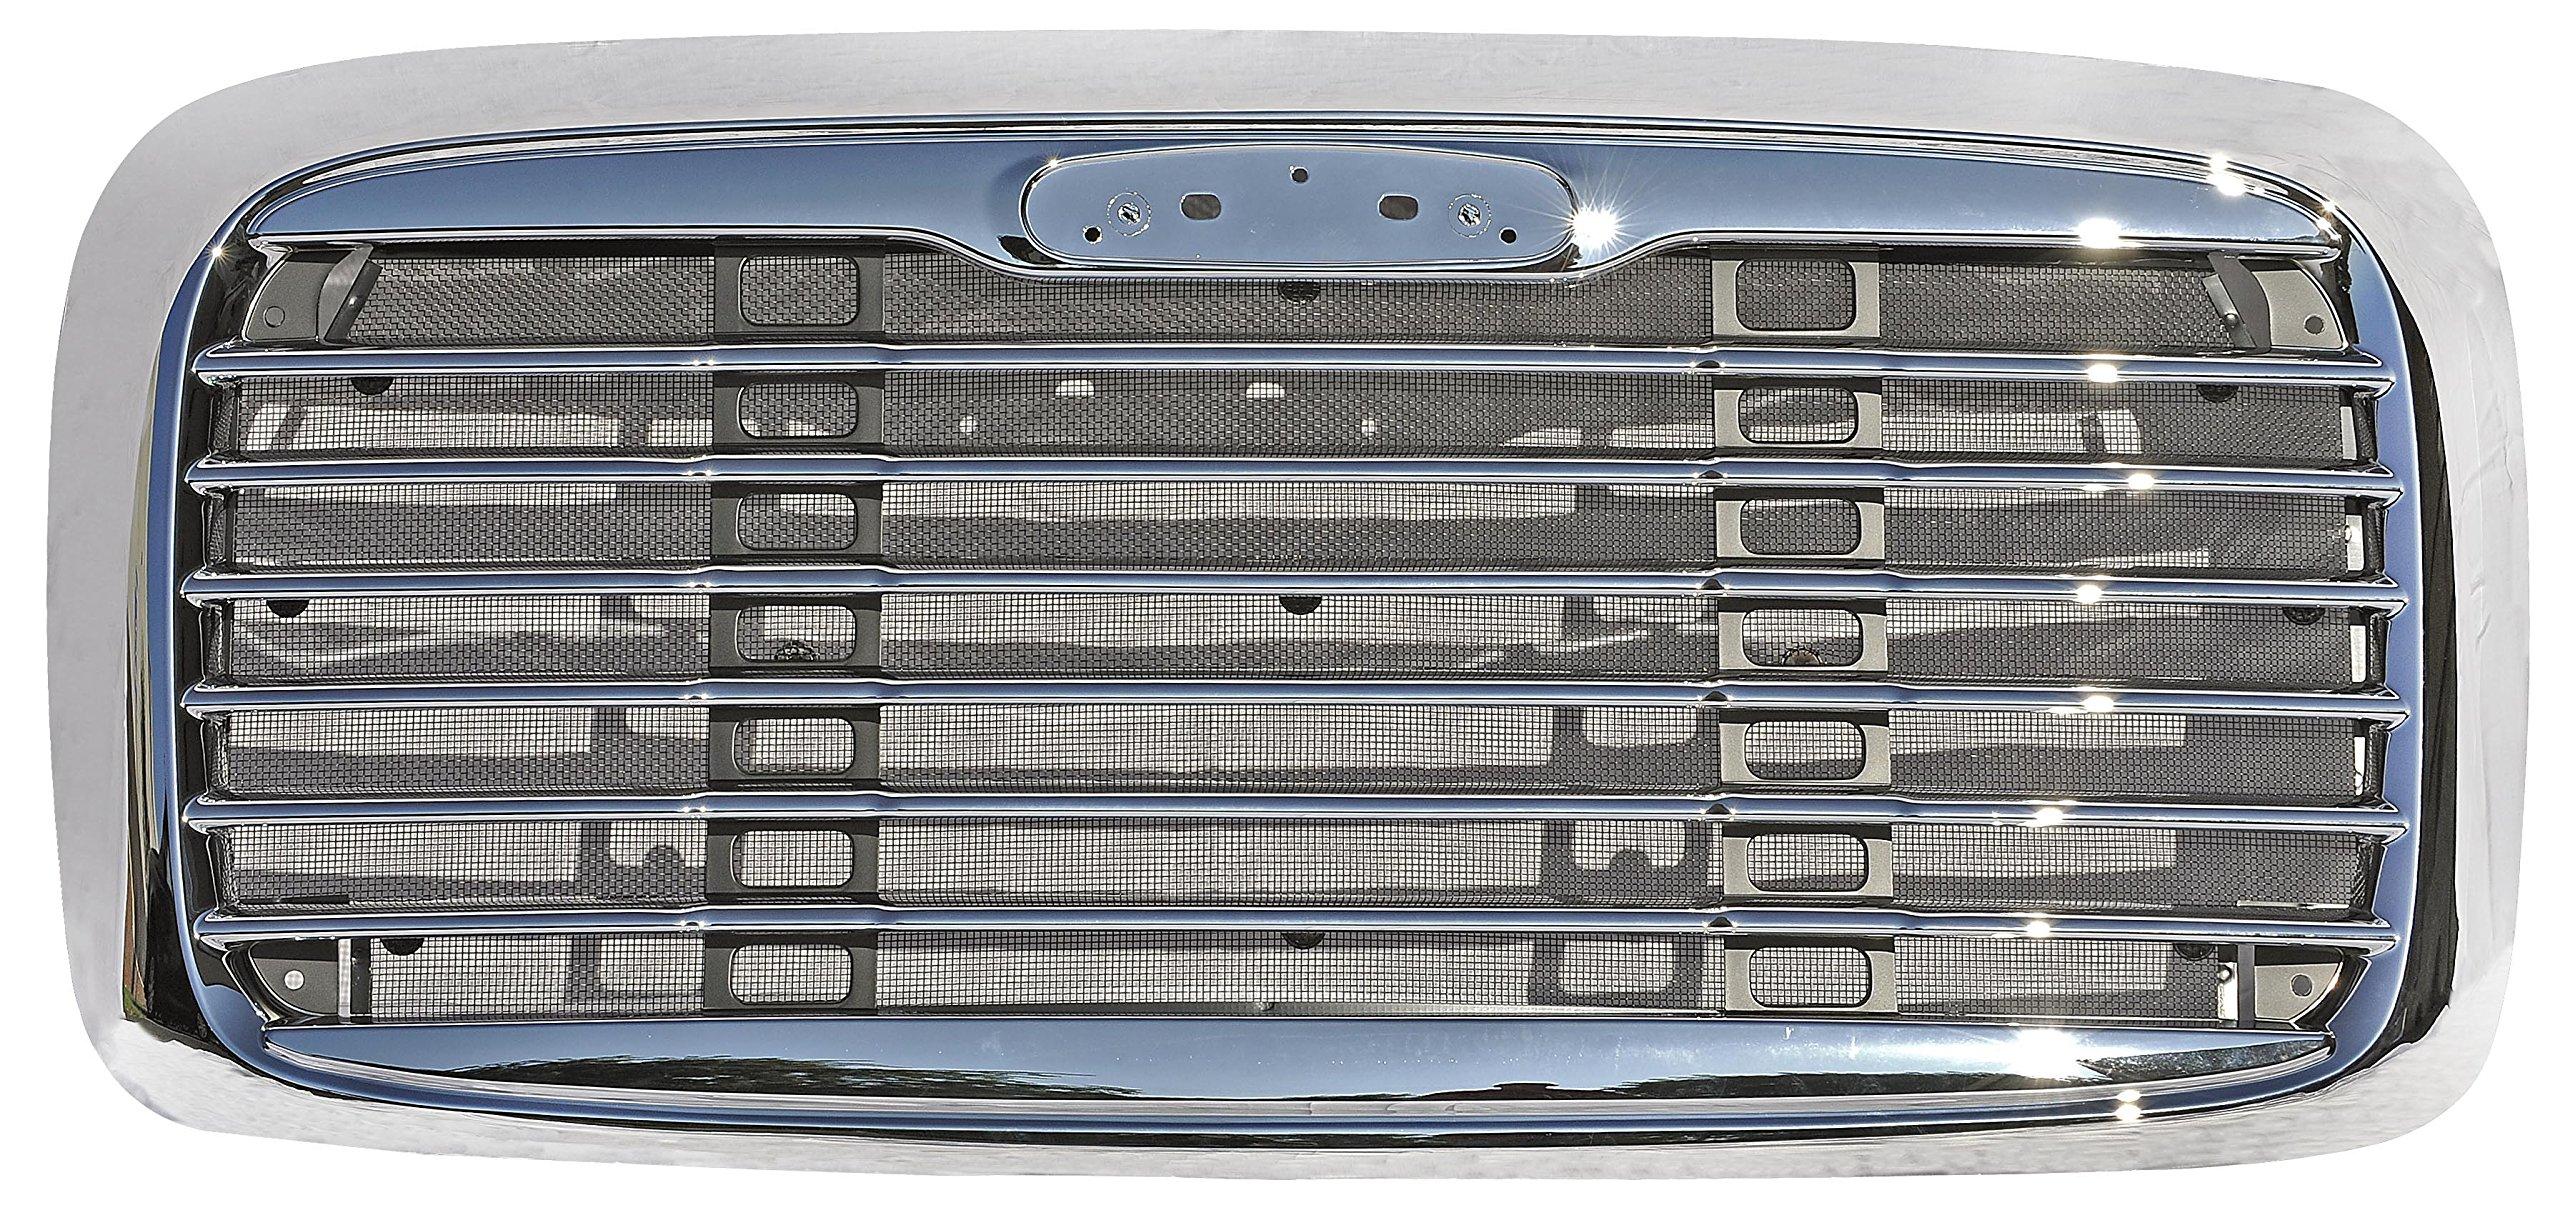 Dorman 242-5202 Freightliner Radiator Grille